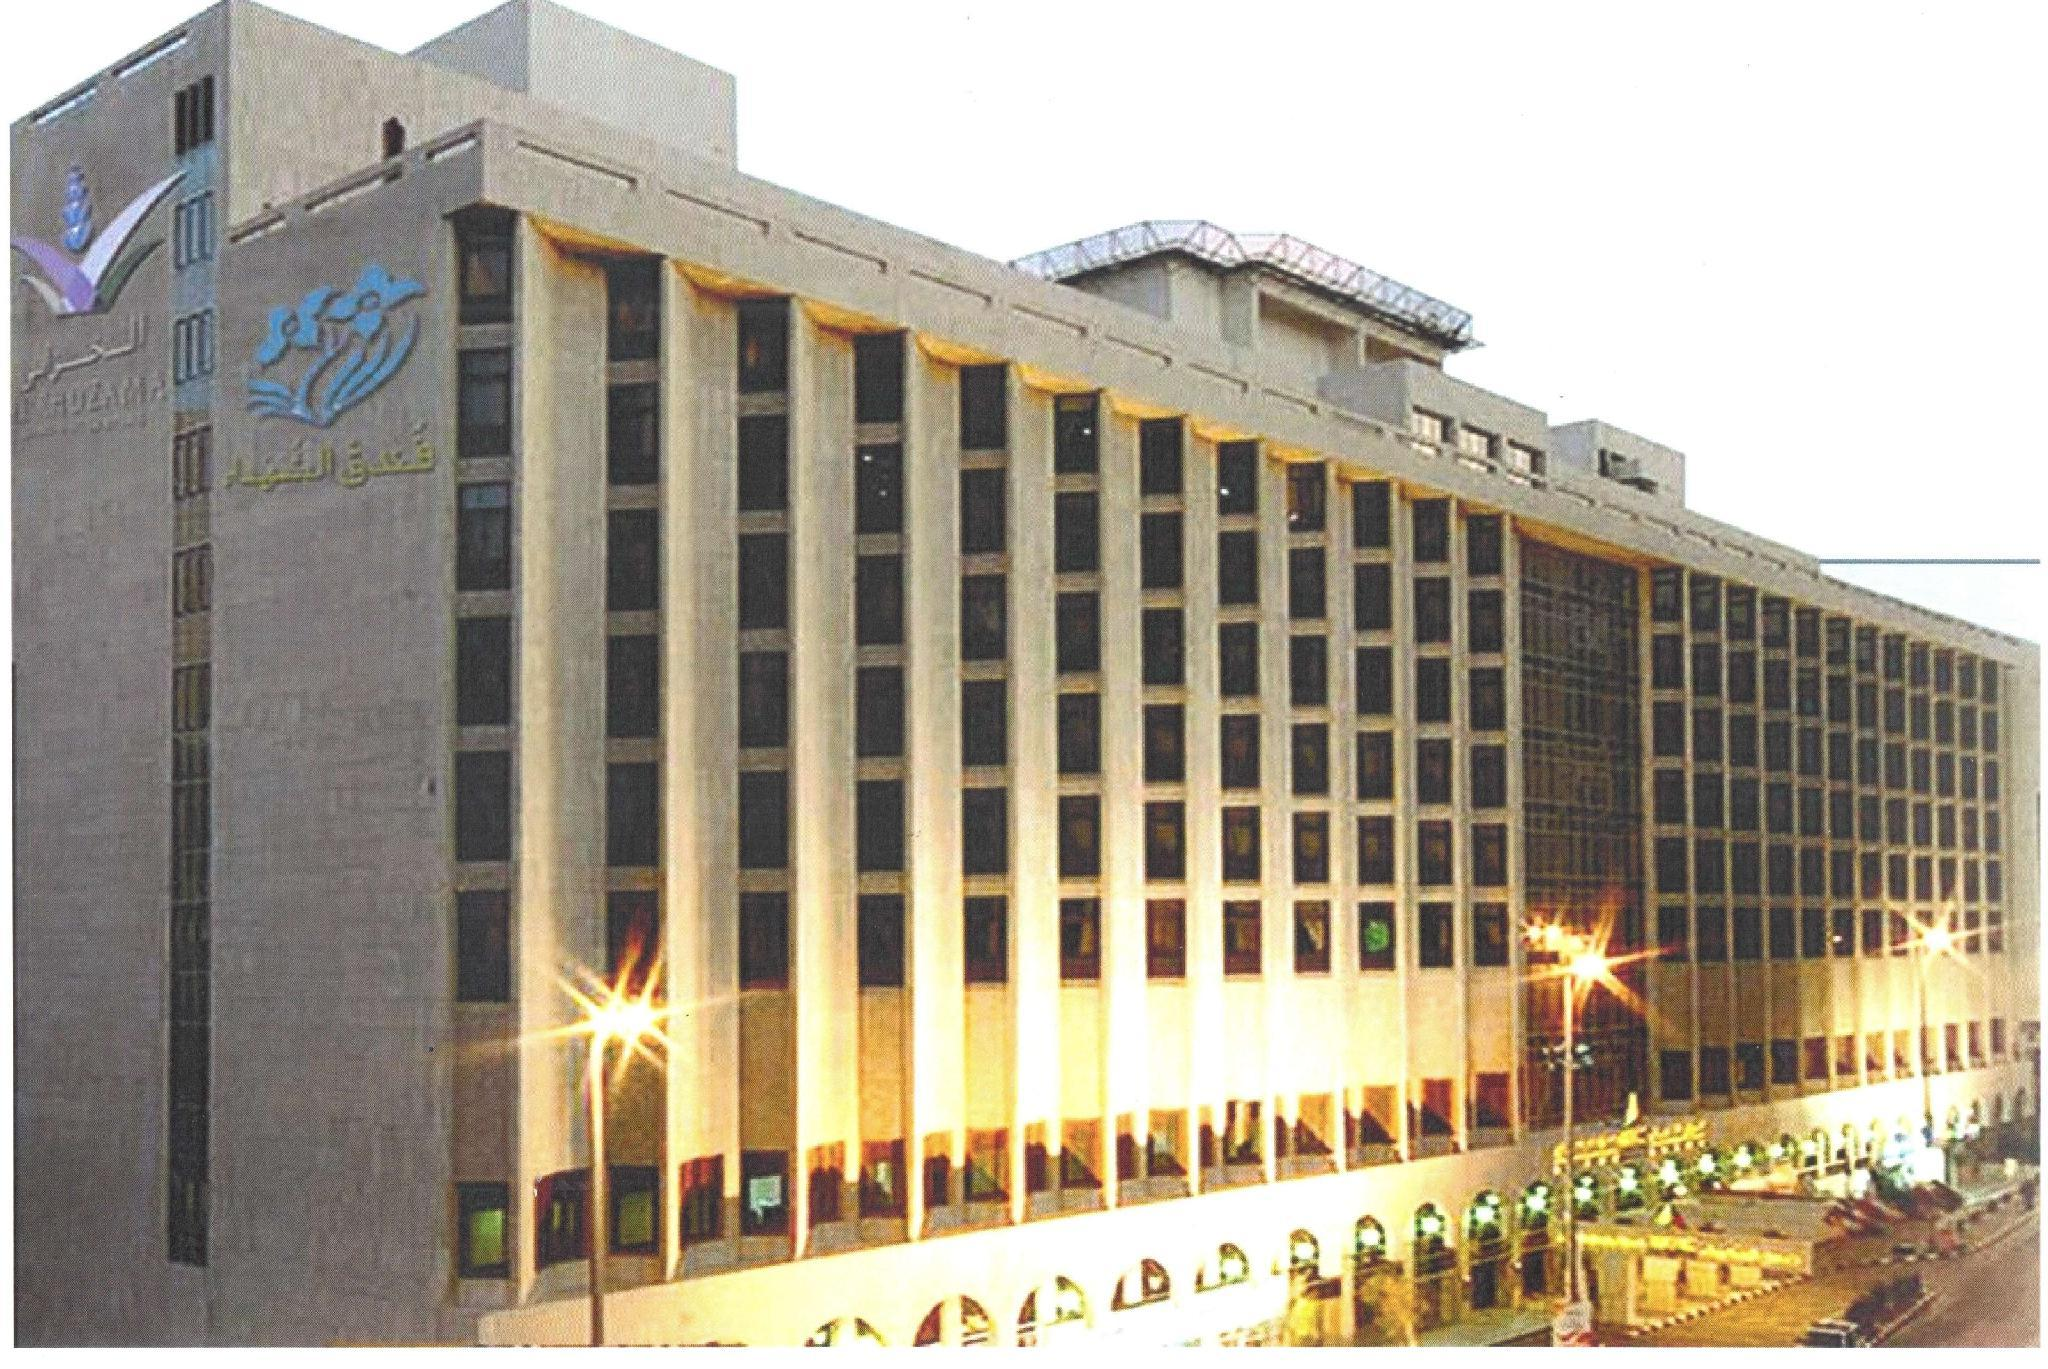 فندق الشهداء Al Shohada Hotel مكة حجز رخيص فوري مع اجودا